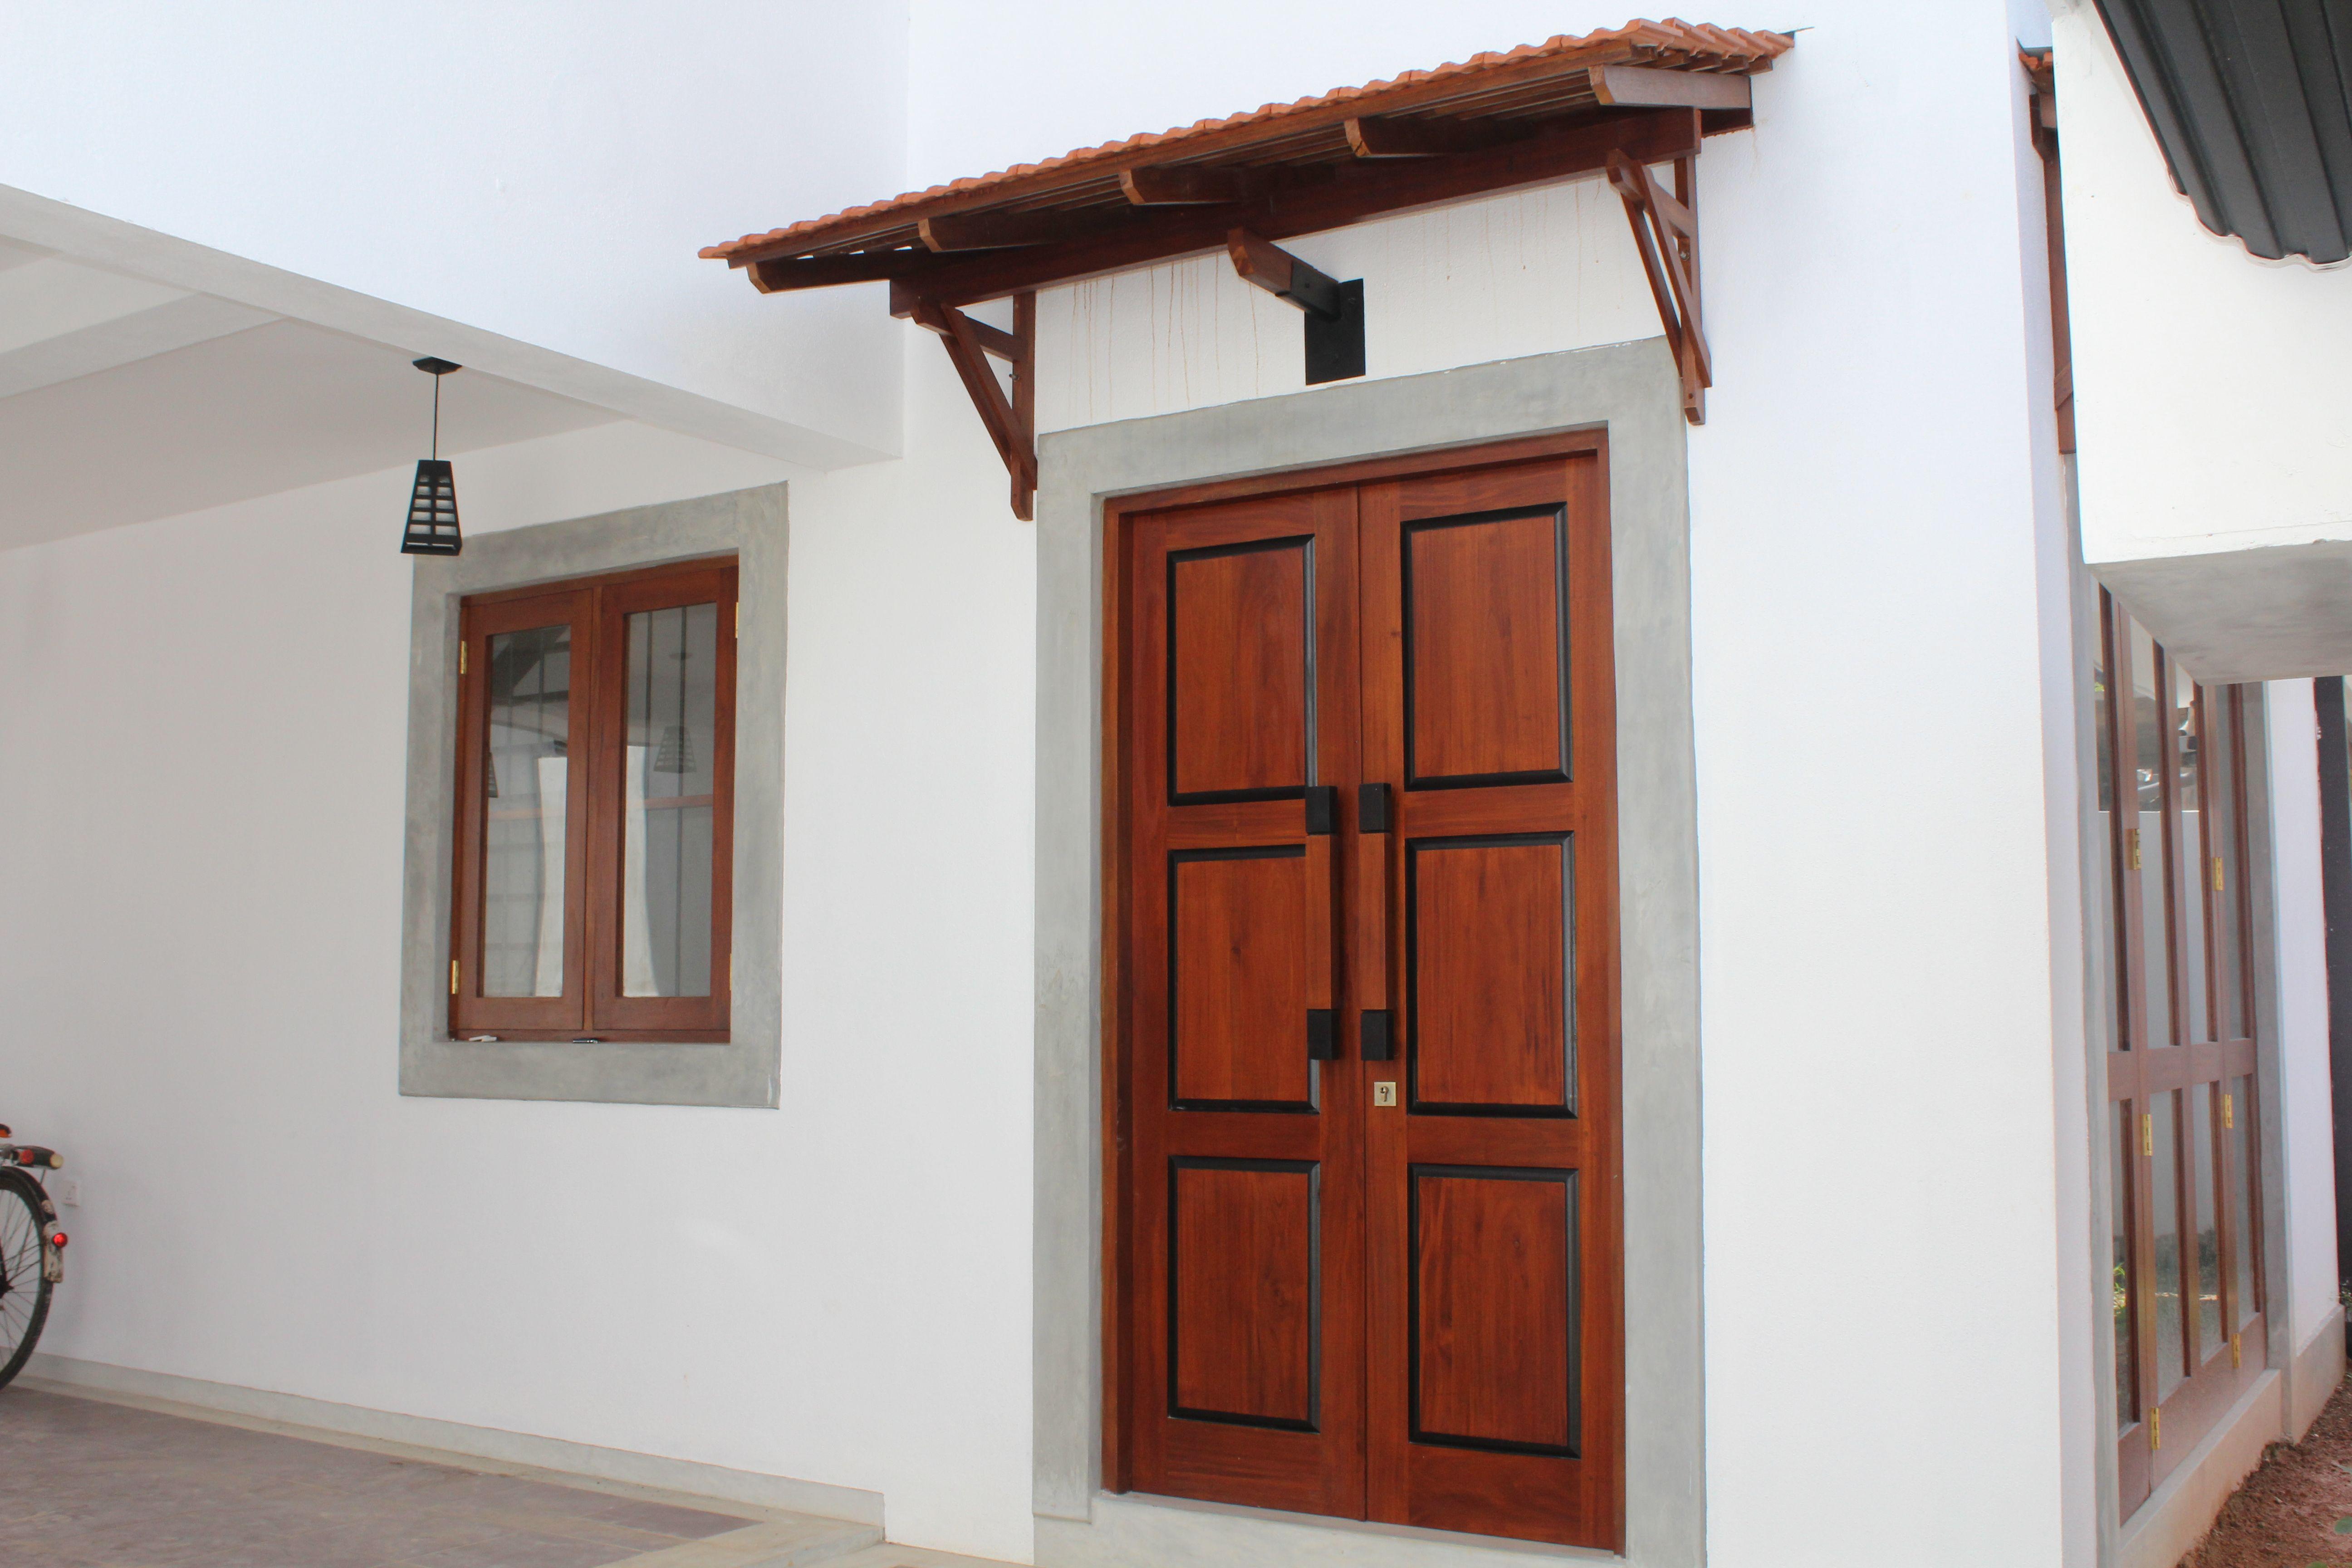 51073cf595c4cfc477a577dedd5164a0 - Houses For Sale In Thalawathugoda At Eden Gardens